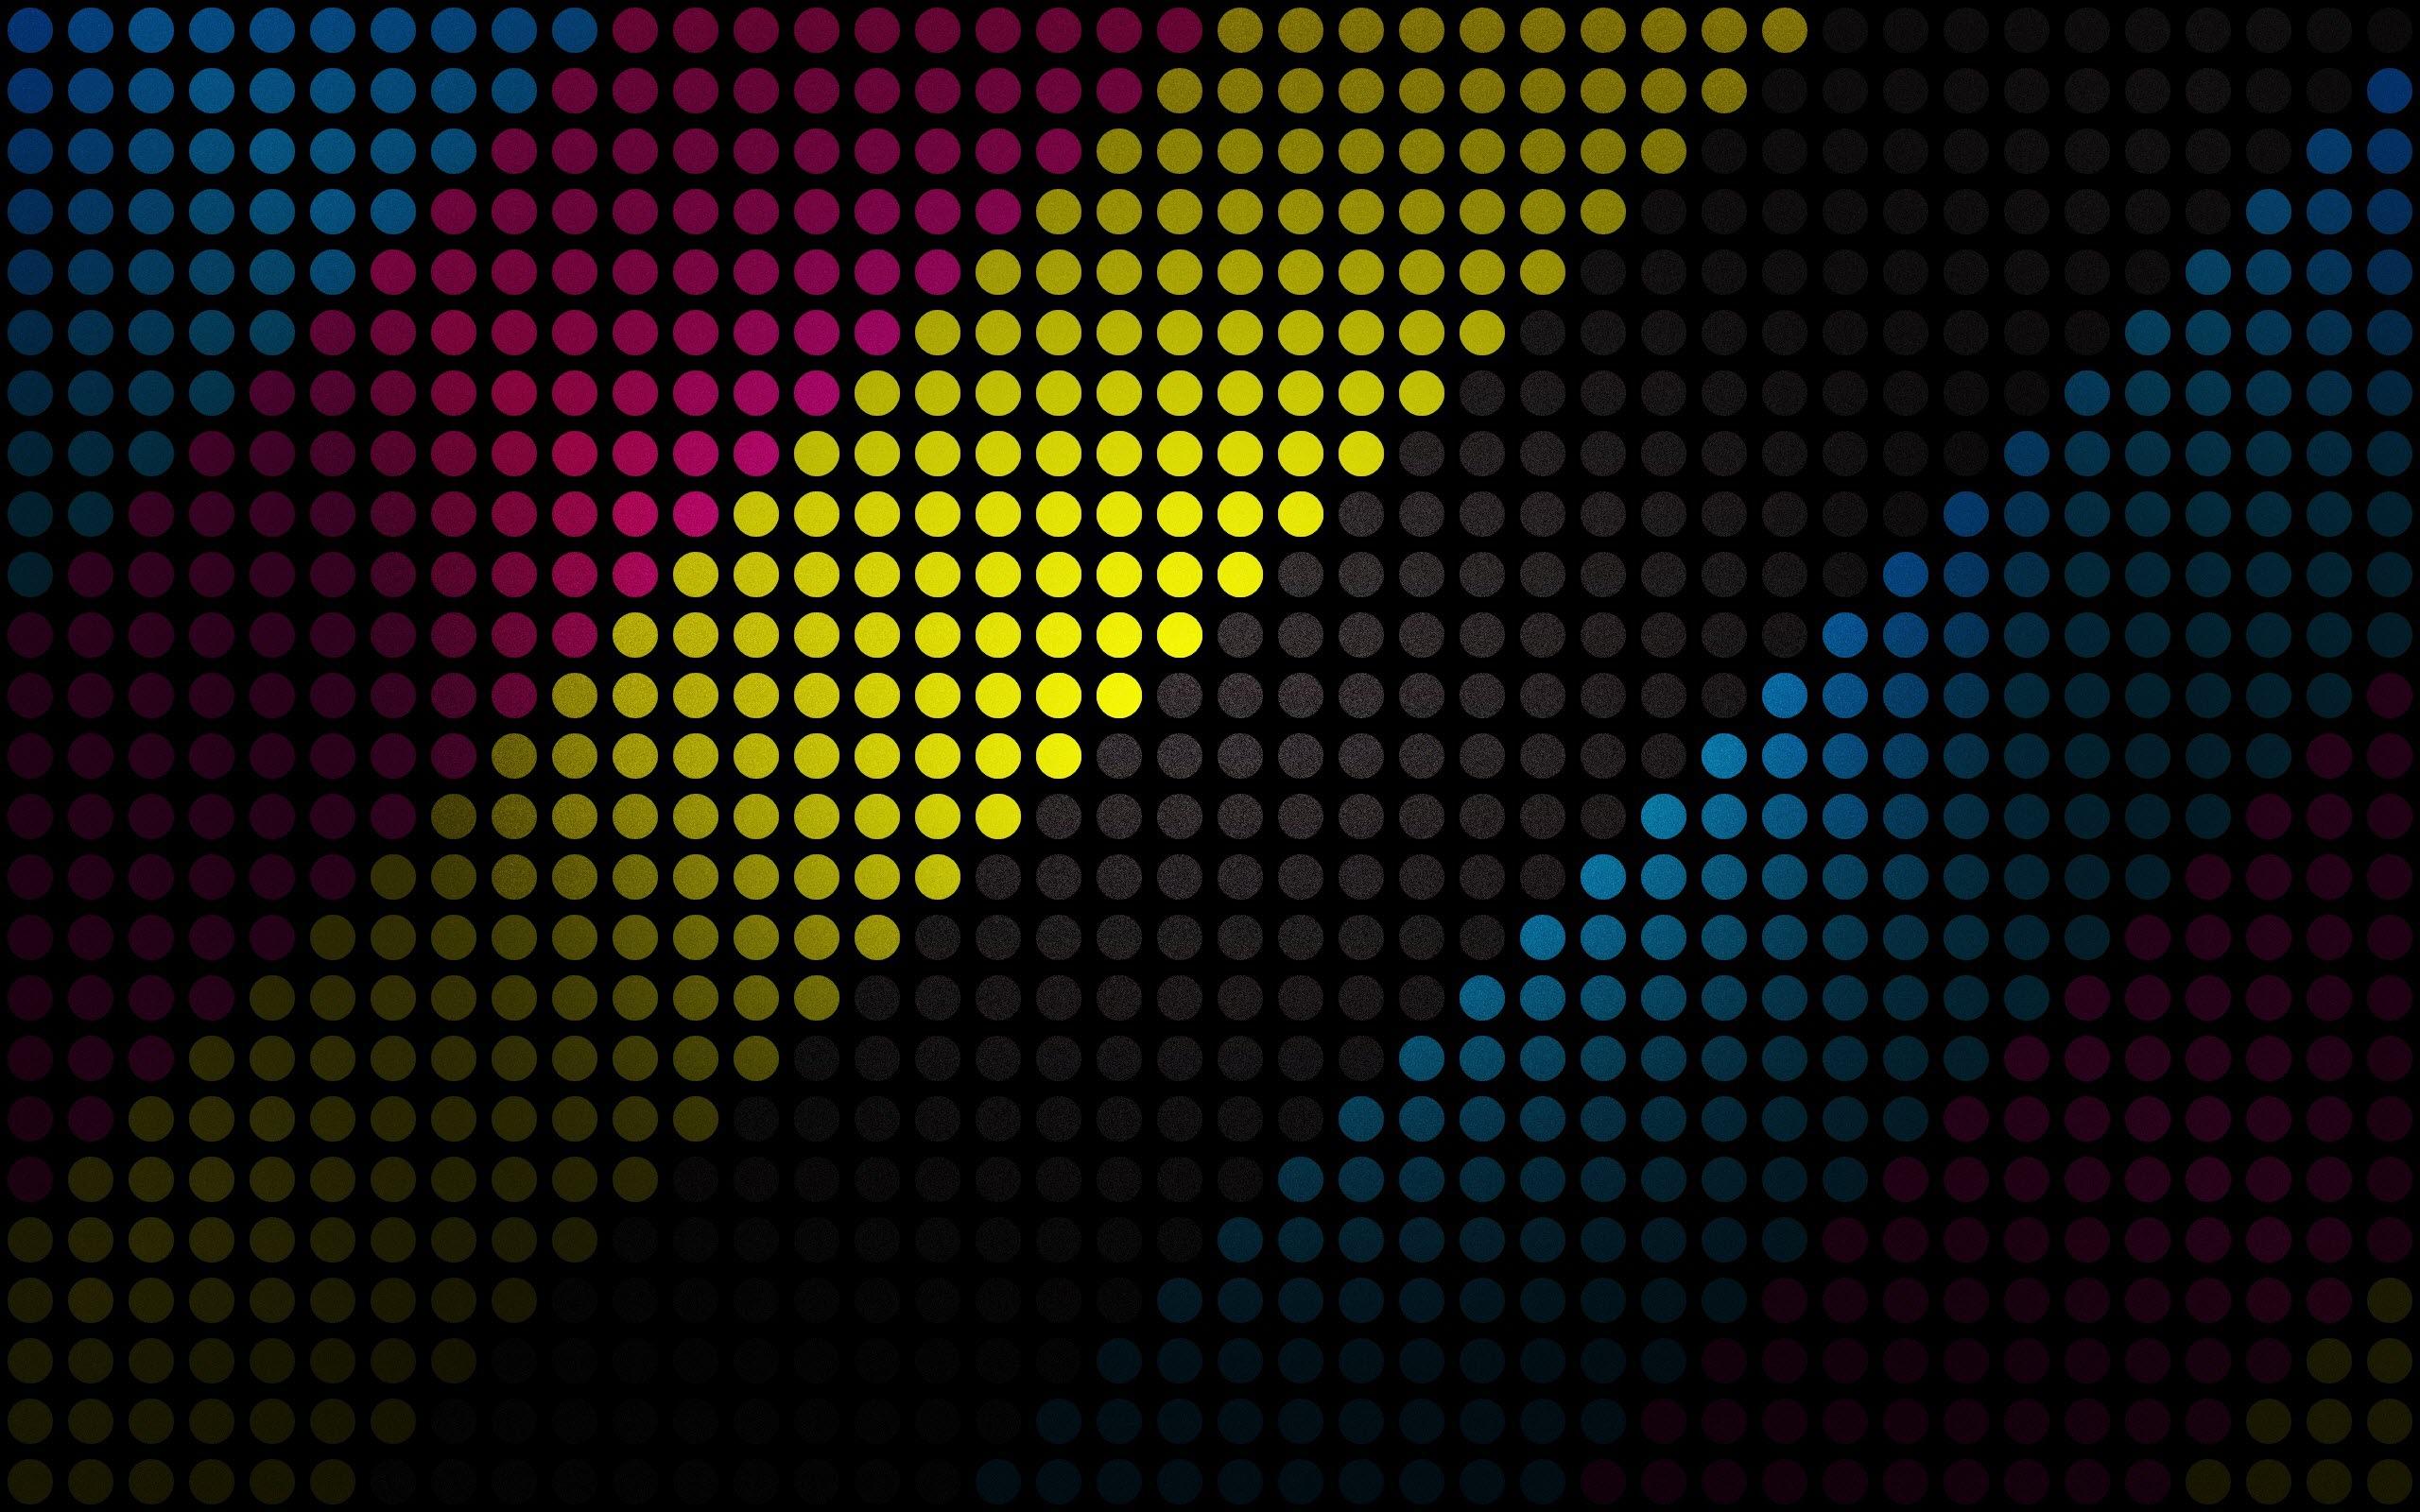 The Best Anime Wallpaper Hd Cool Wallpapers For Girls Pixelstalk Net